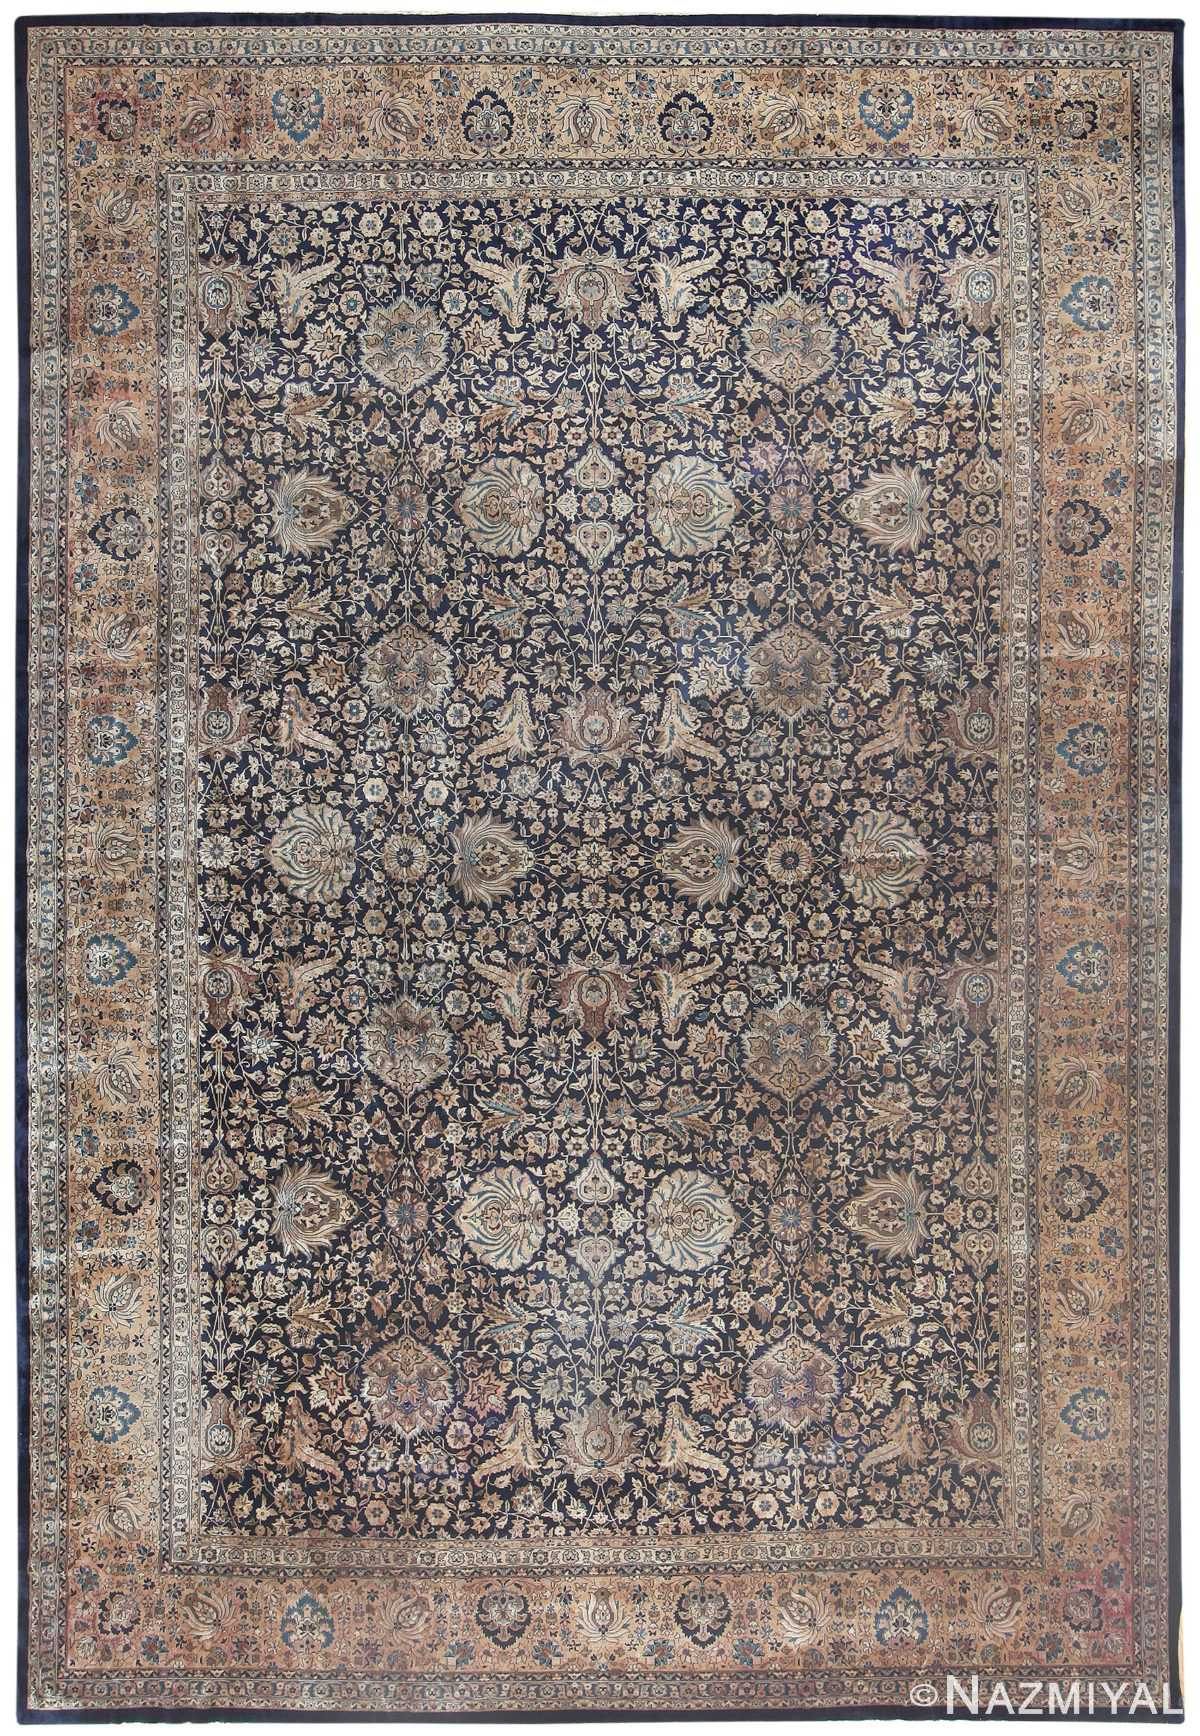 Blue Antique Persian Kerman Rug 50077 by nazmiyal